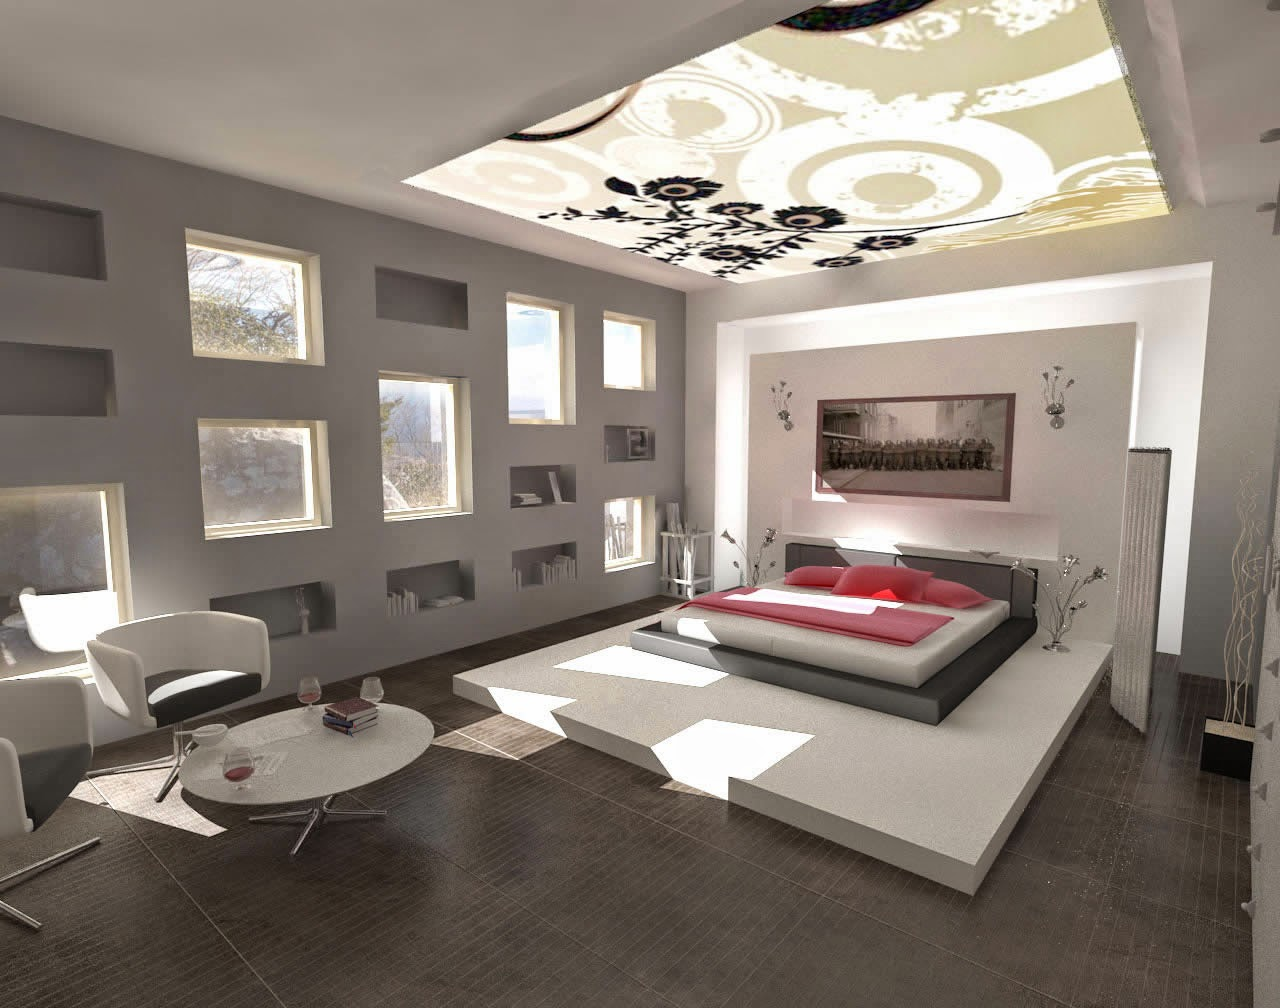 Interior Design Ideas for Modern Homes | MODERN INTERIOR